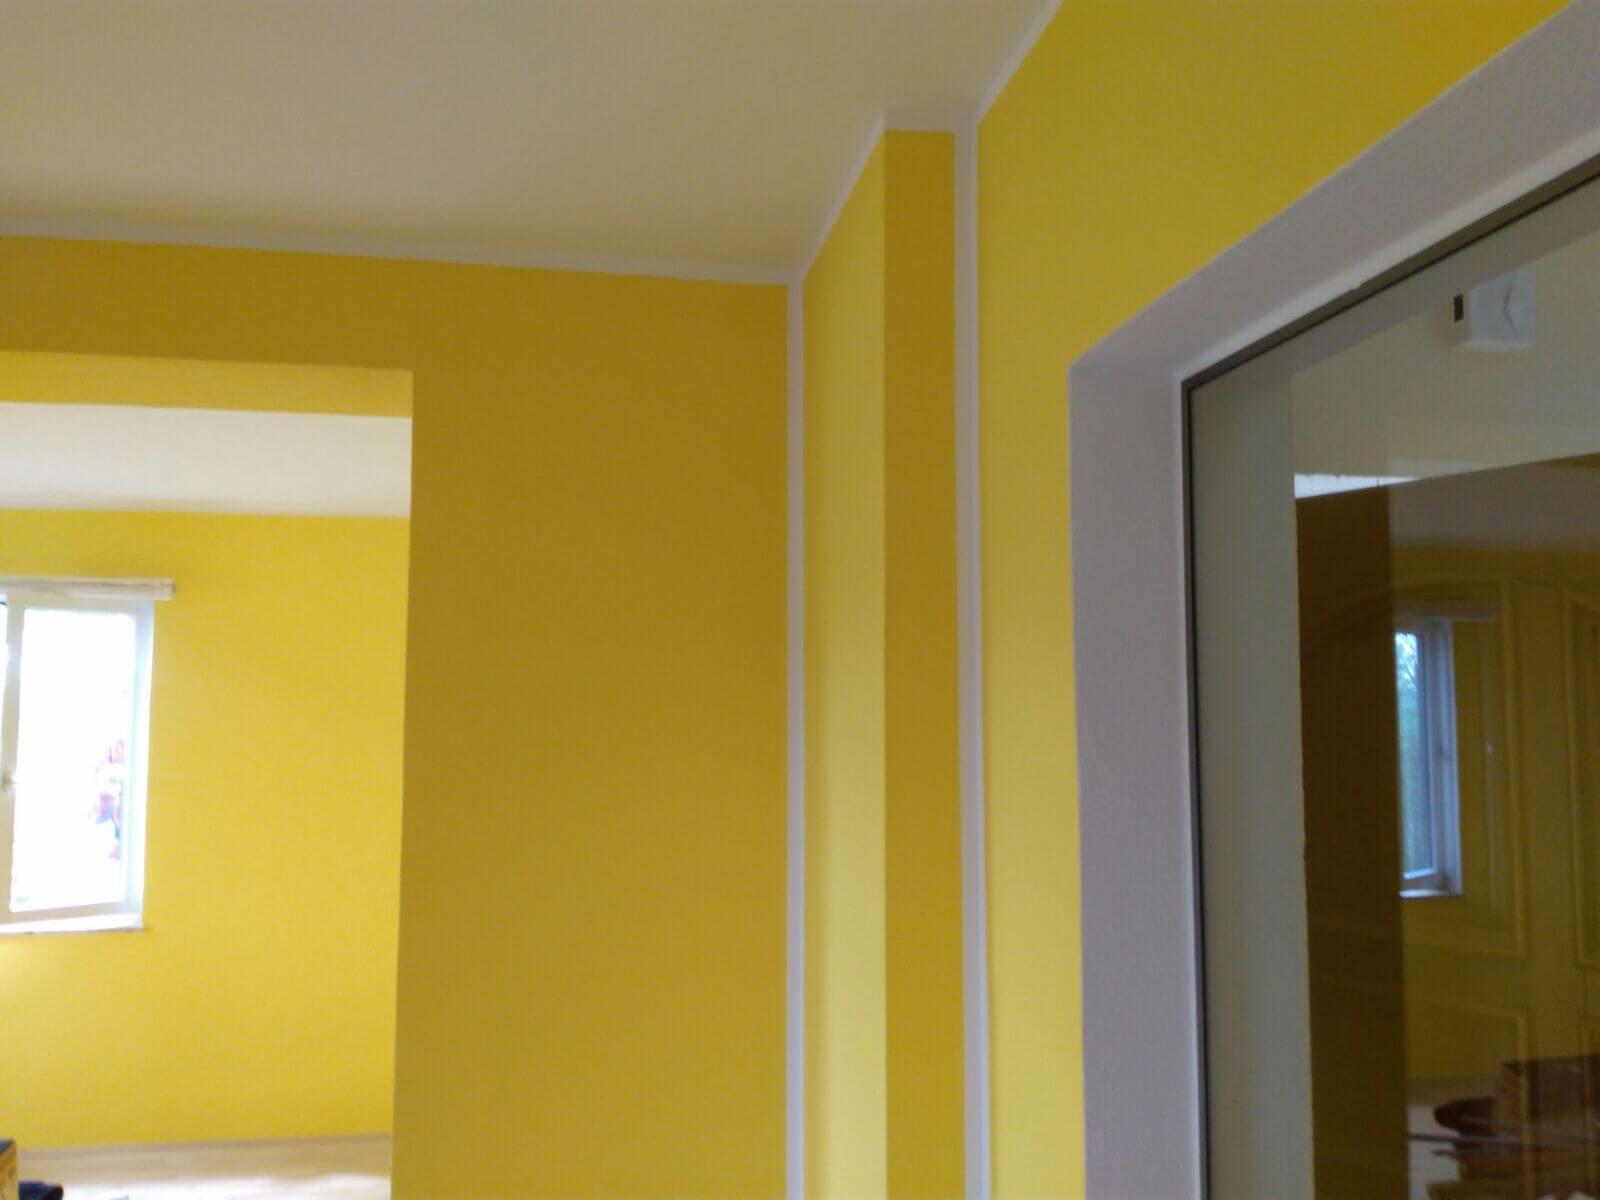 Malerei-malerbetrieb-ulrich-innen-gelb